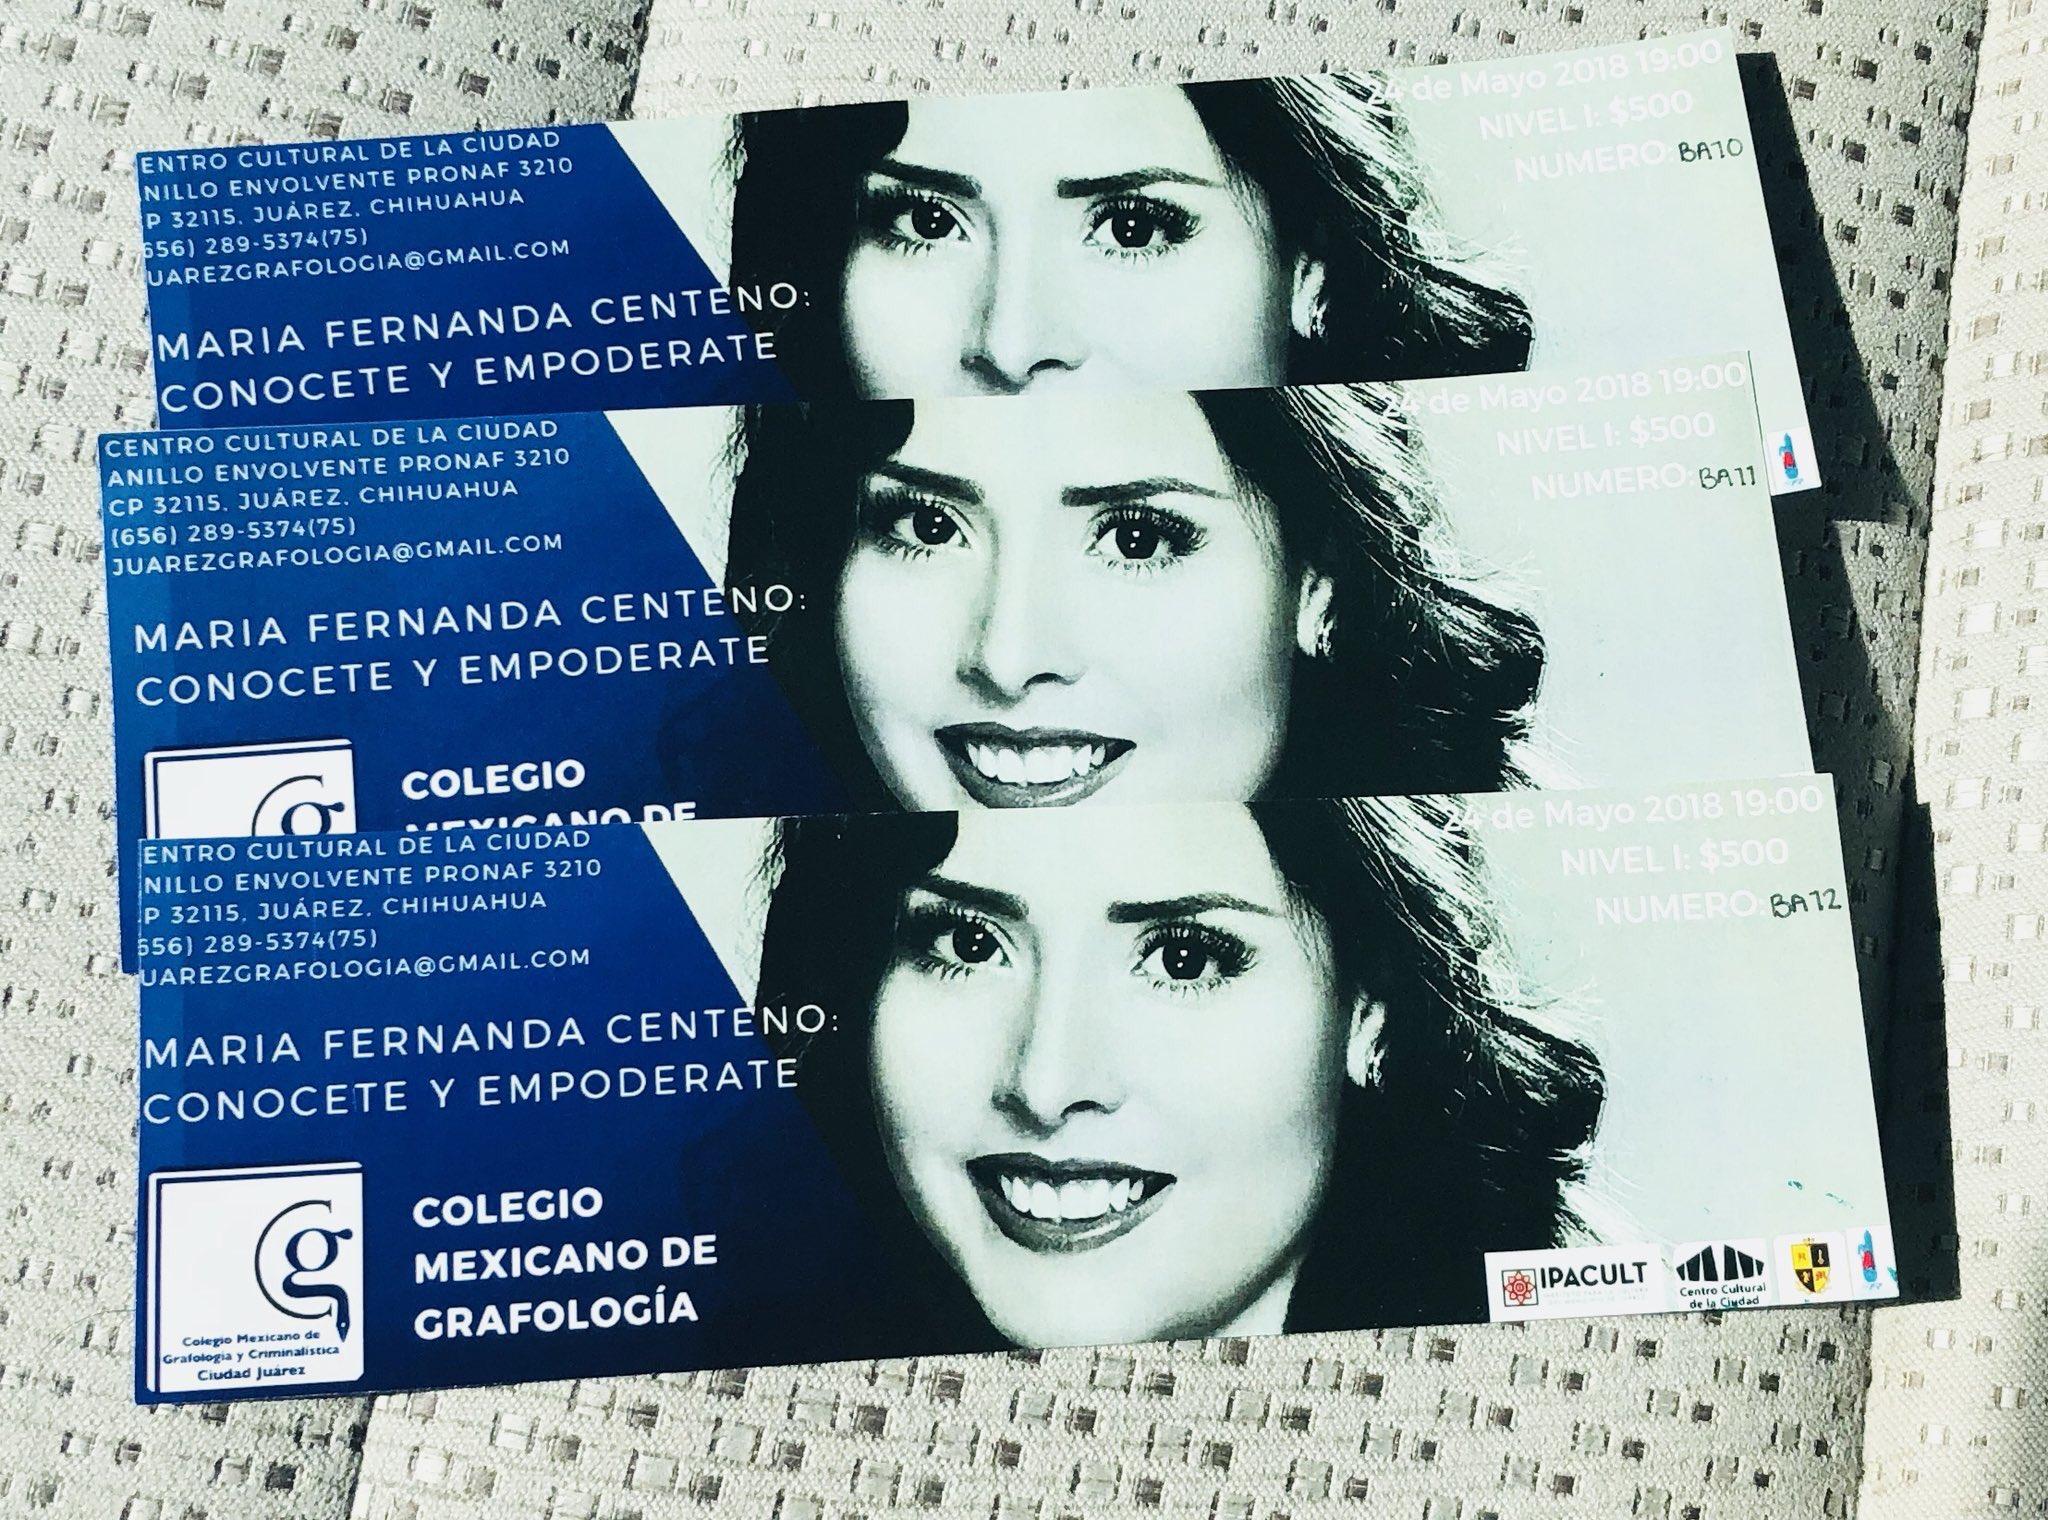 Quieres boletos para vernos en la conferencia de grafología en ciudad Juárez? Escríbeme a juarezgrafologia@gmail.com https://t.co/k2gw9z9ksQ